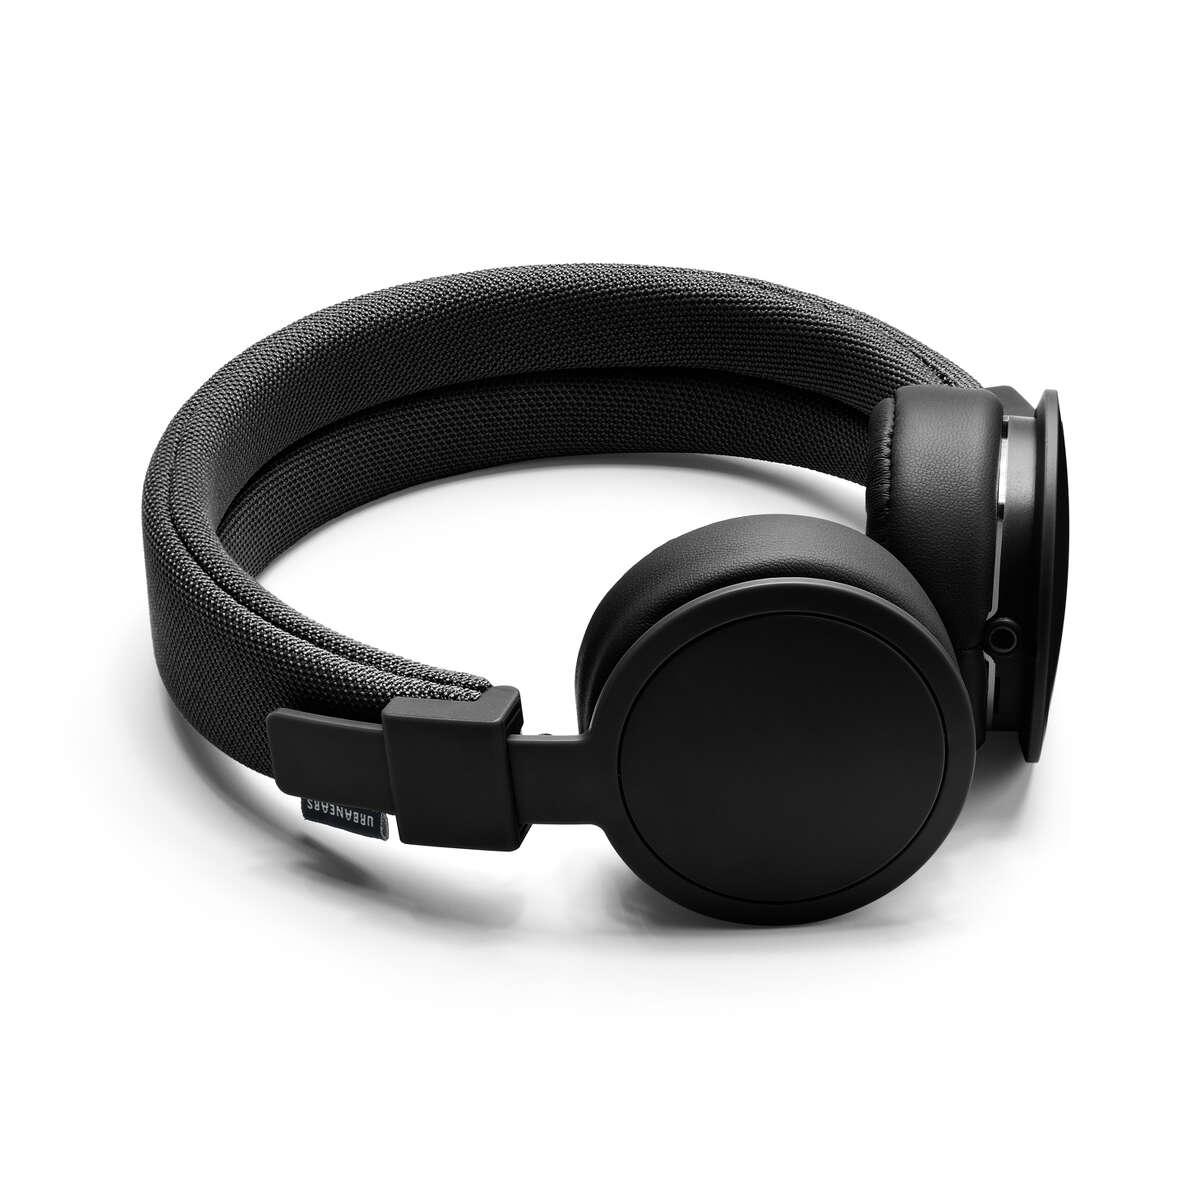 The Plattan ADV headphones by Urbanears.